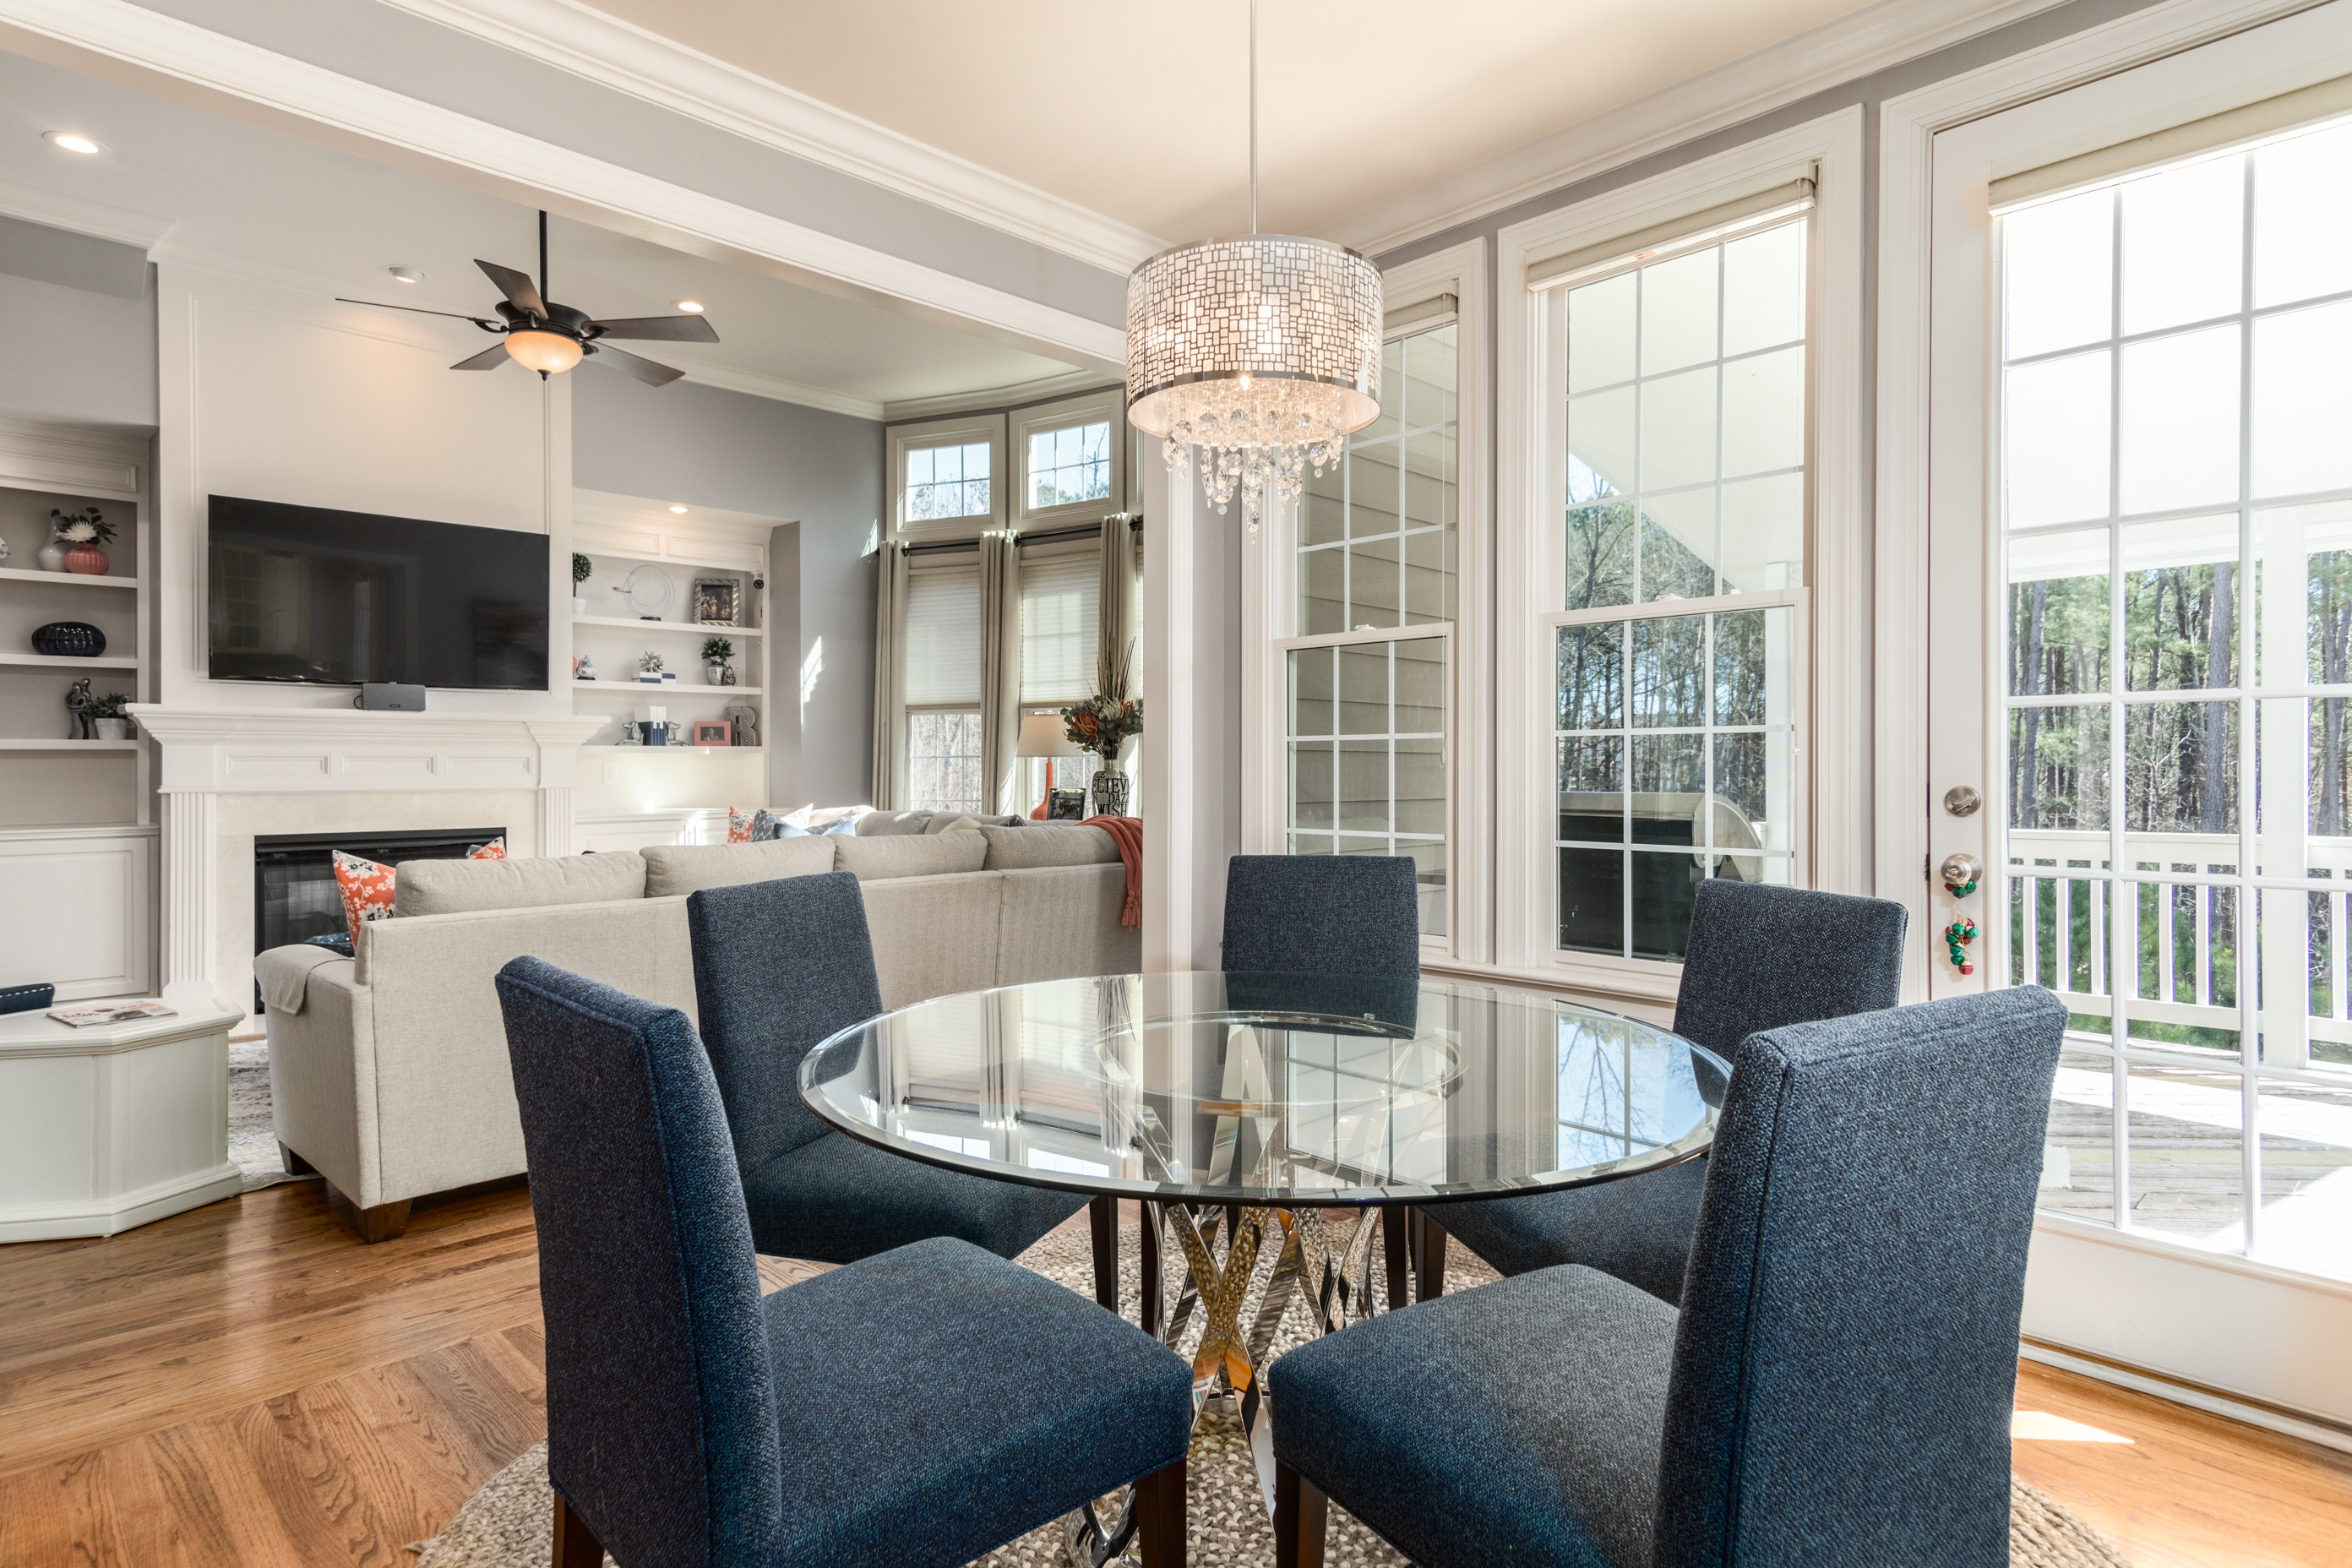 Composition Tips for Real Estate Photos